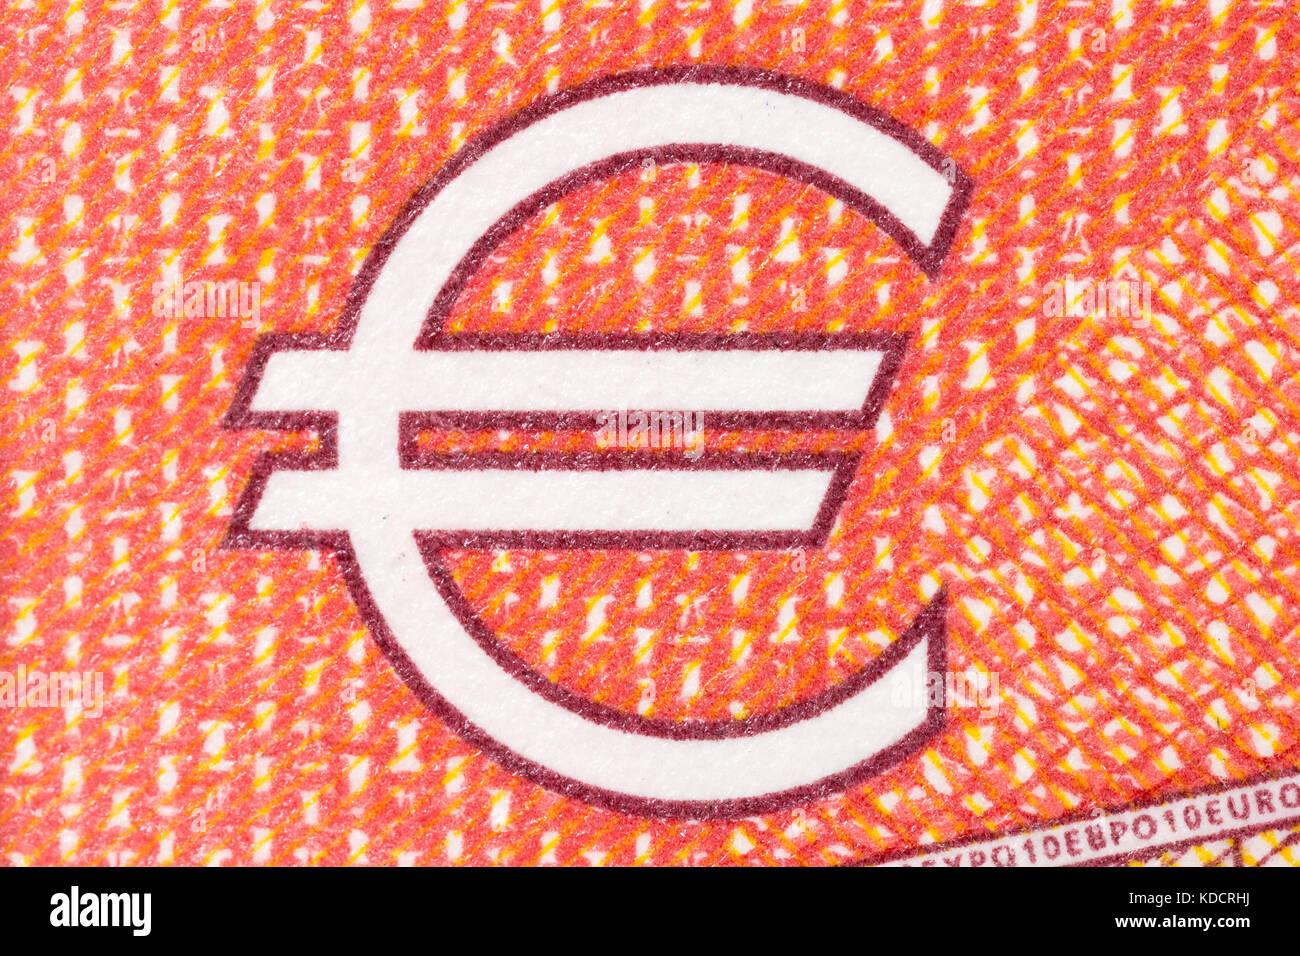 Euro symbol on red background. - Stock Image